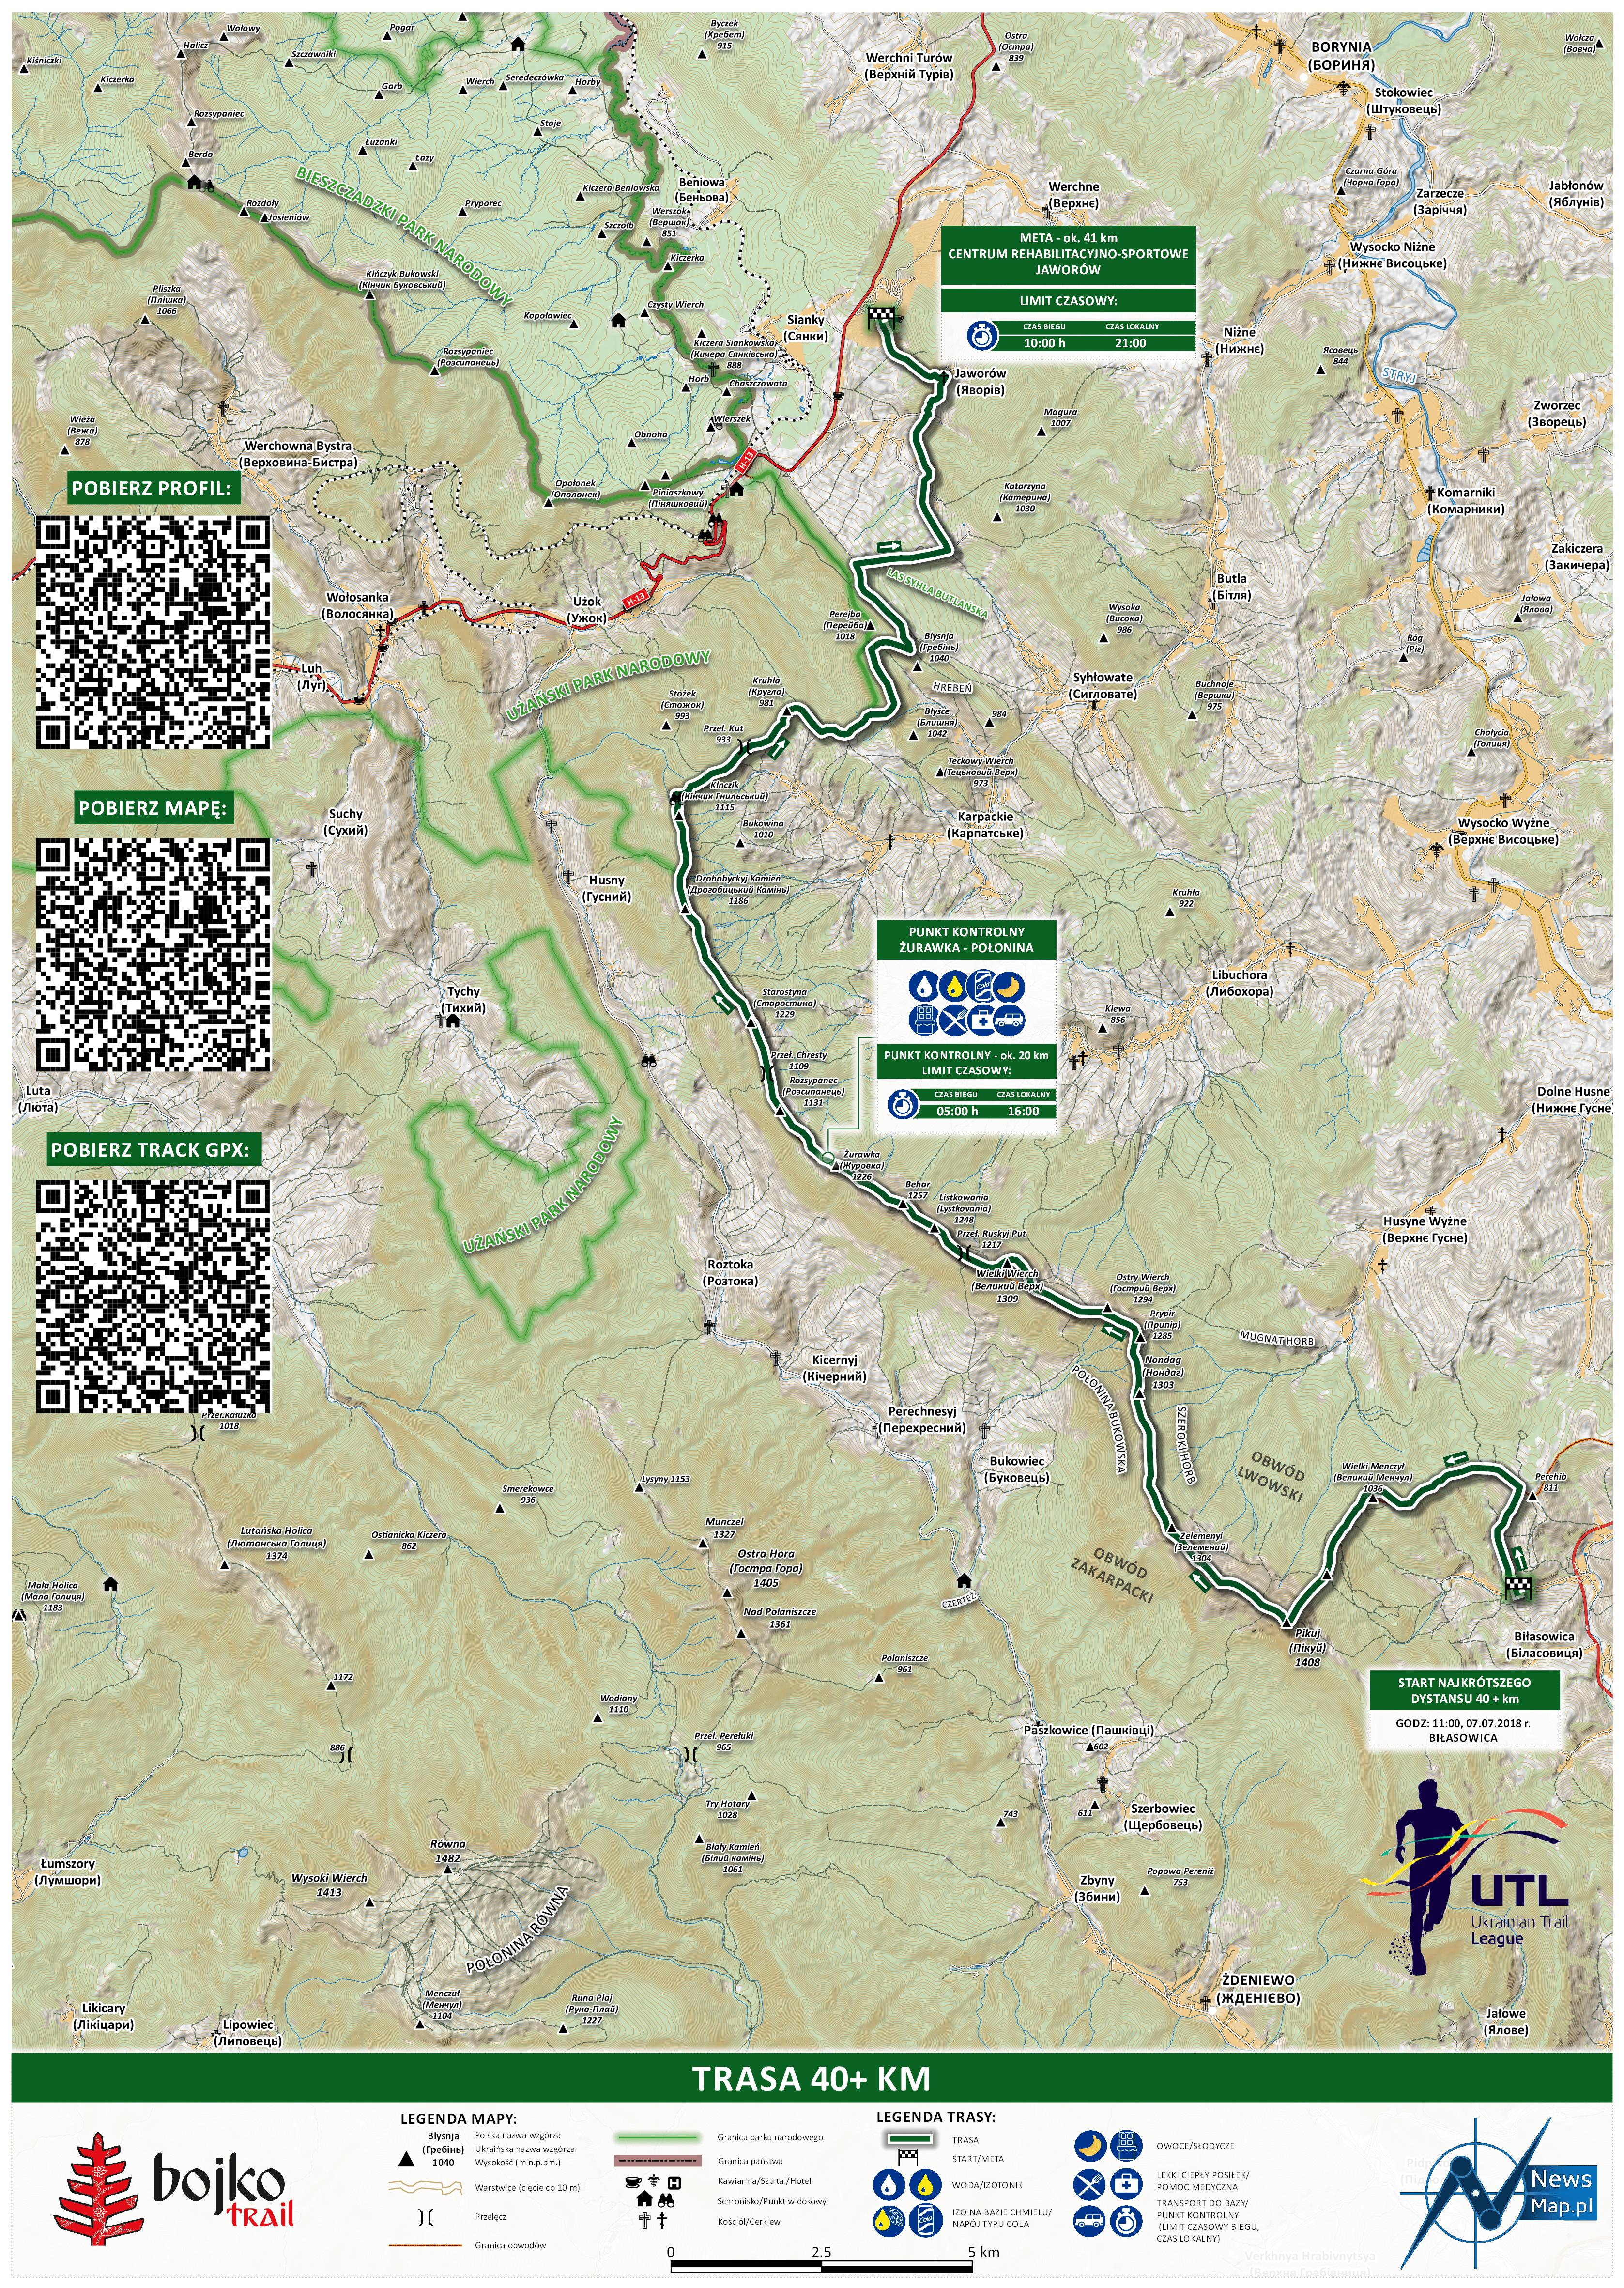 Bojko Trail +40